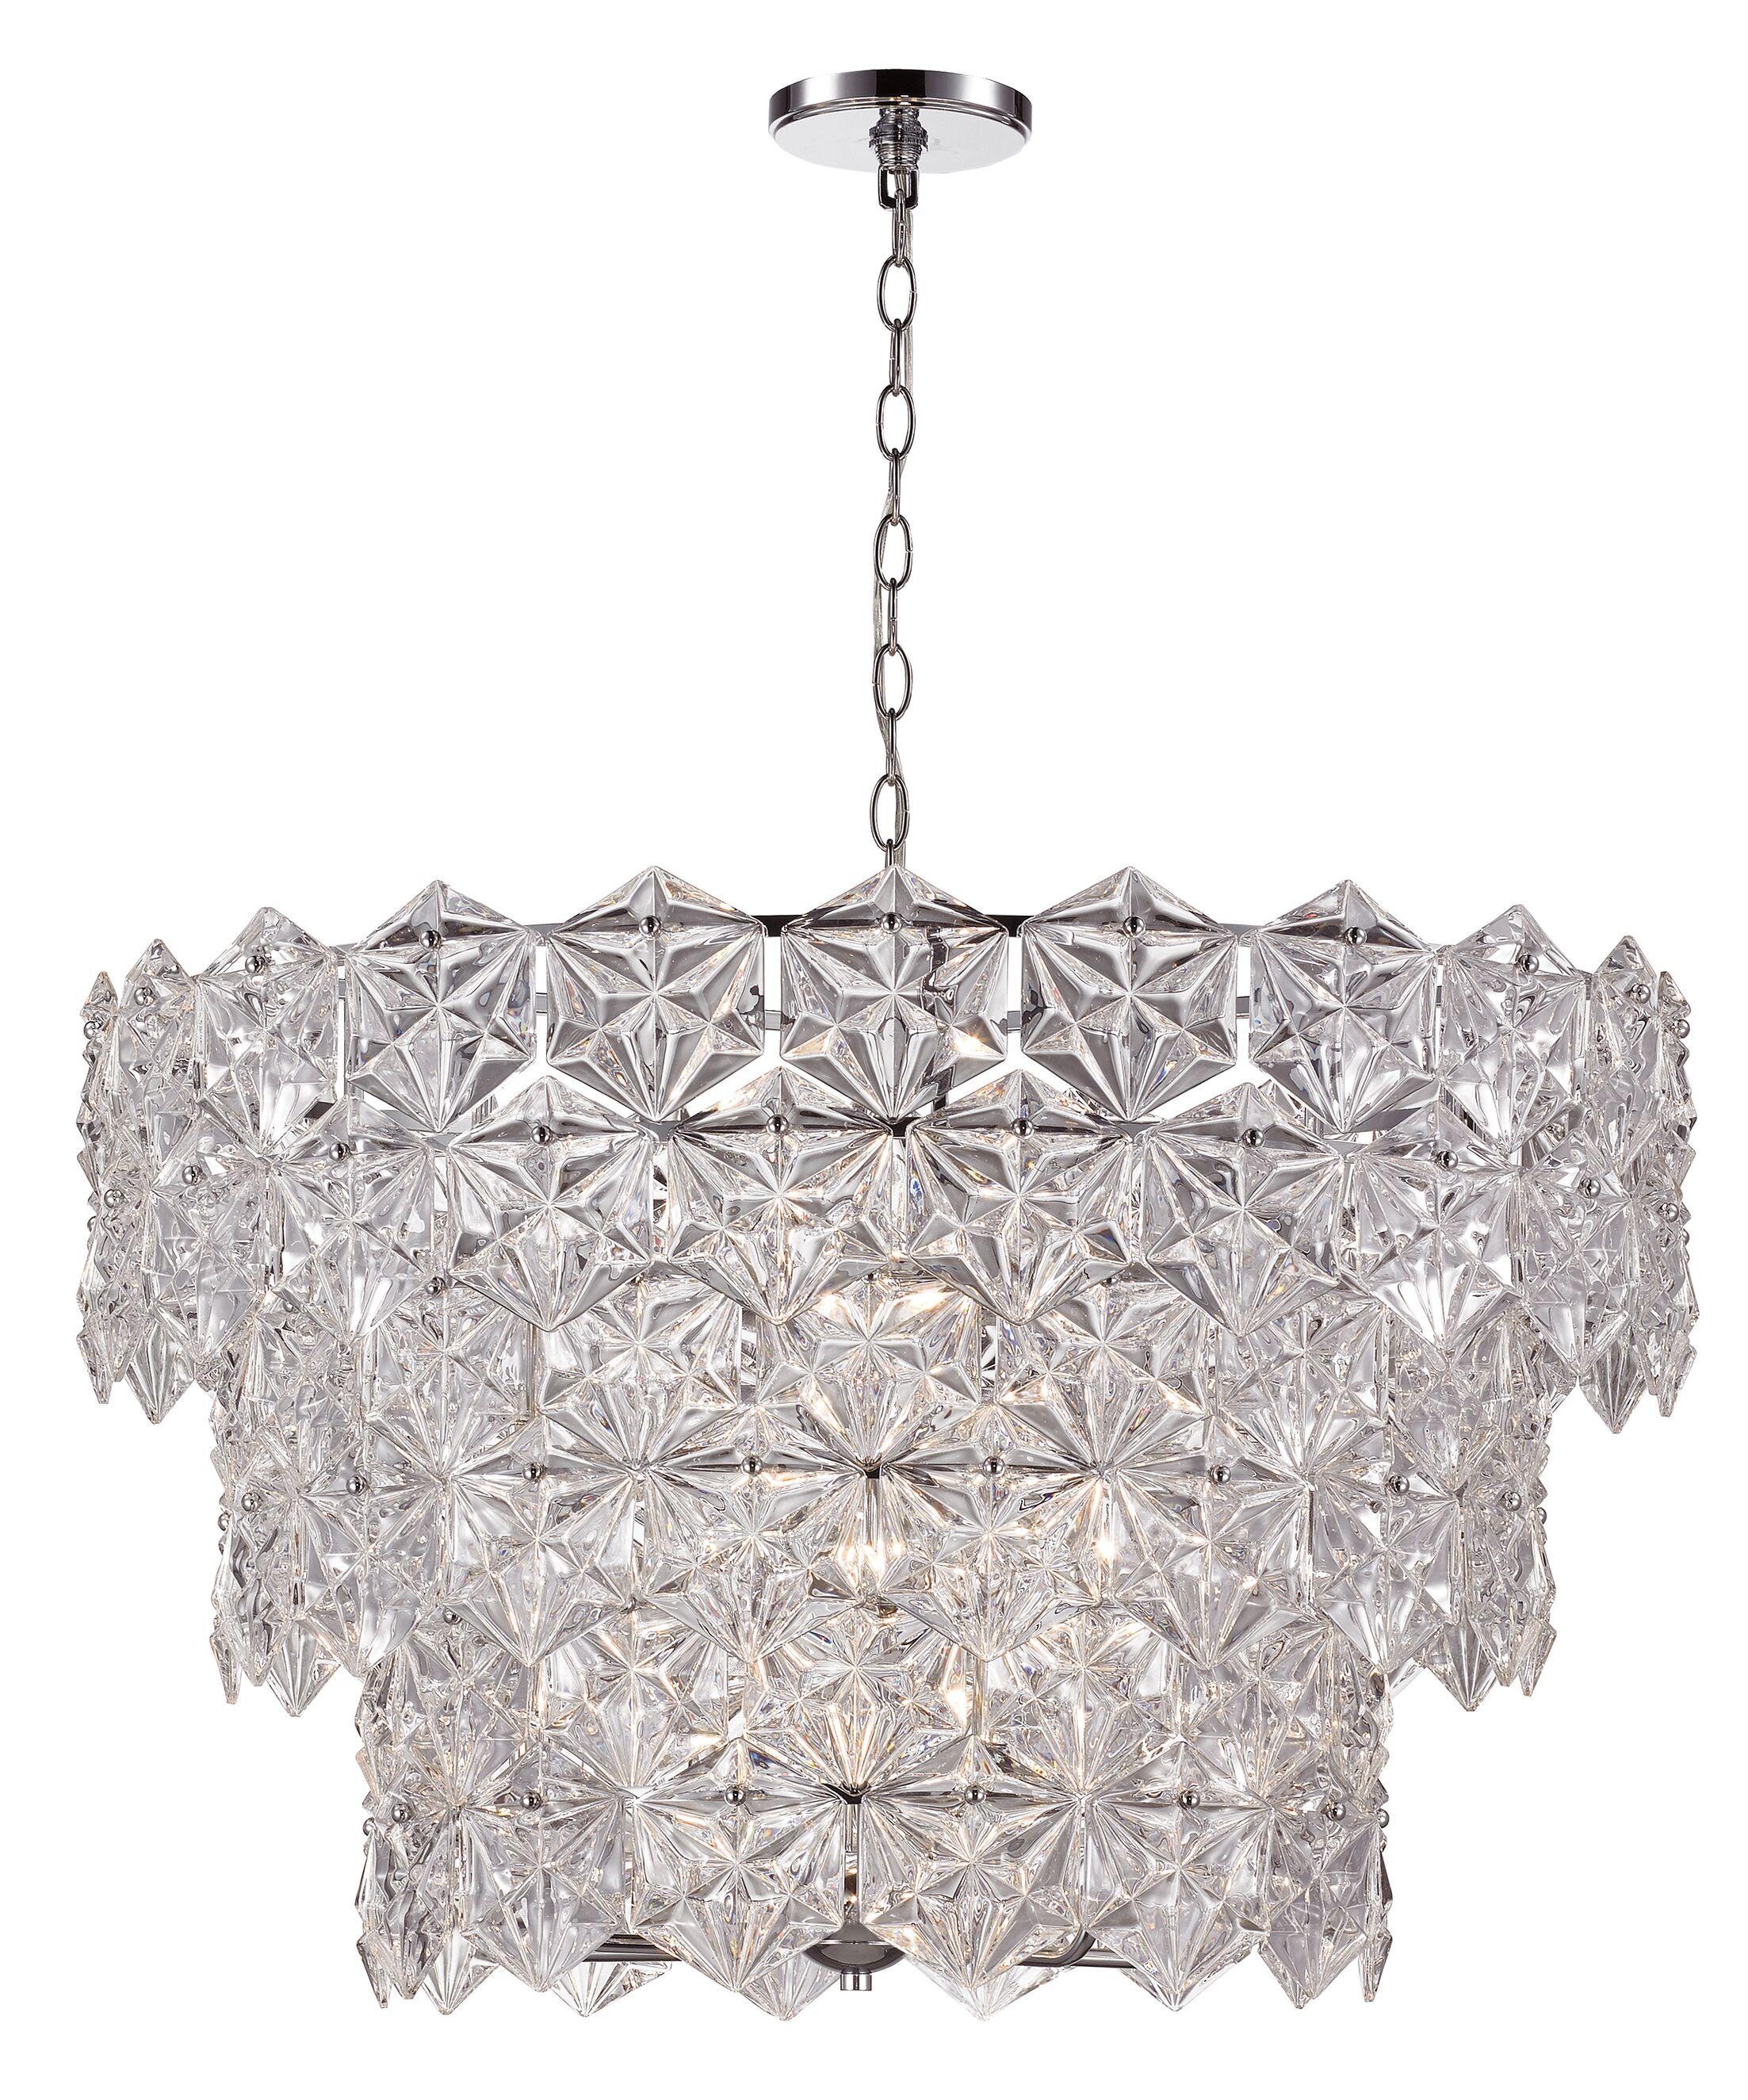 Burton 9-Light Crystal Chandelier